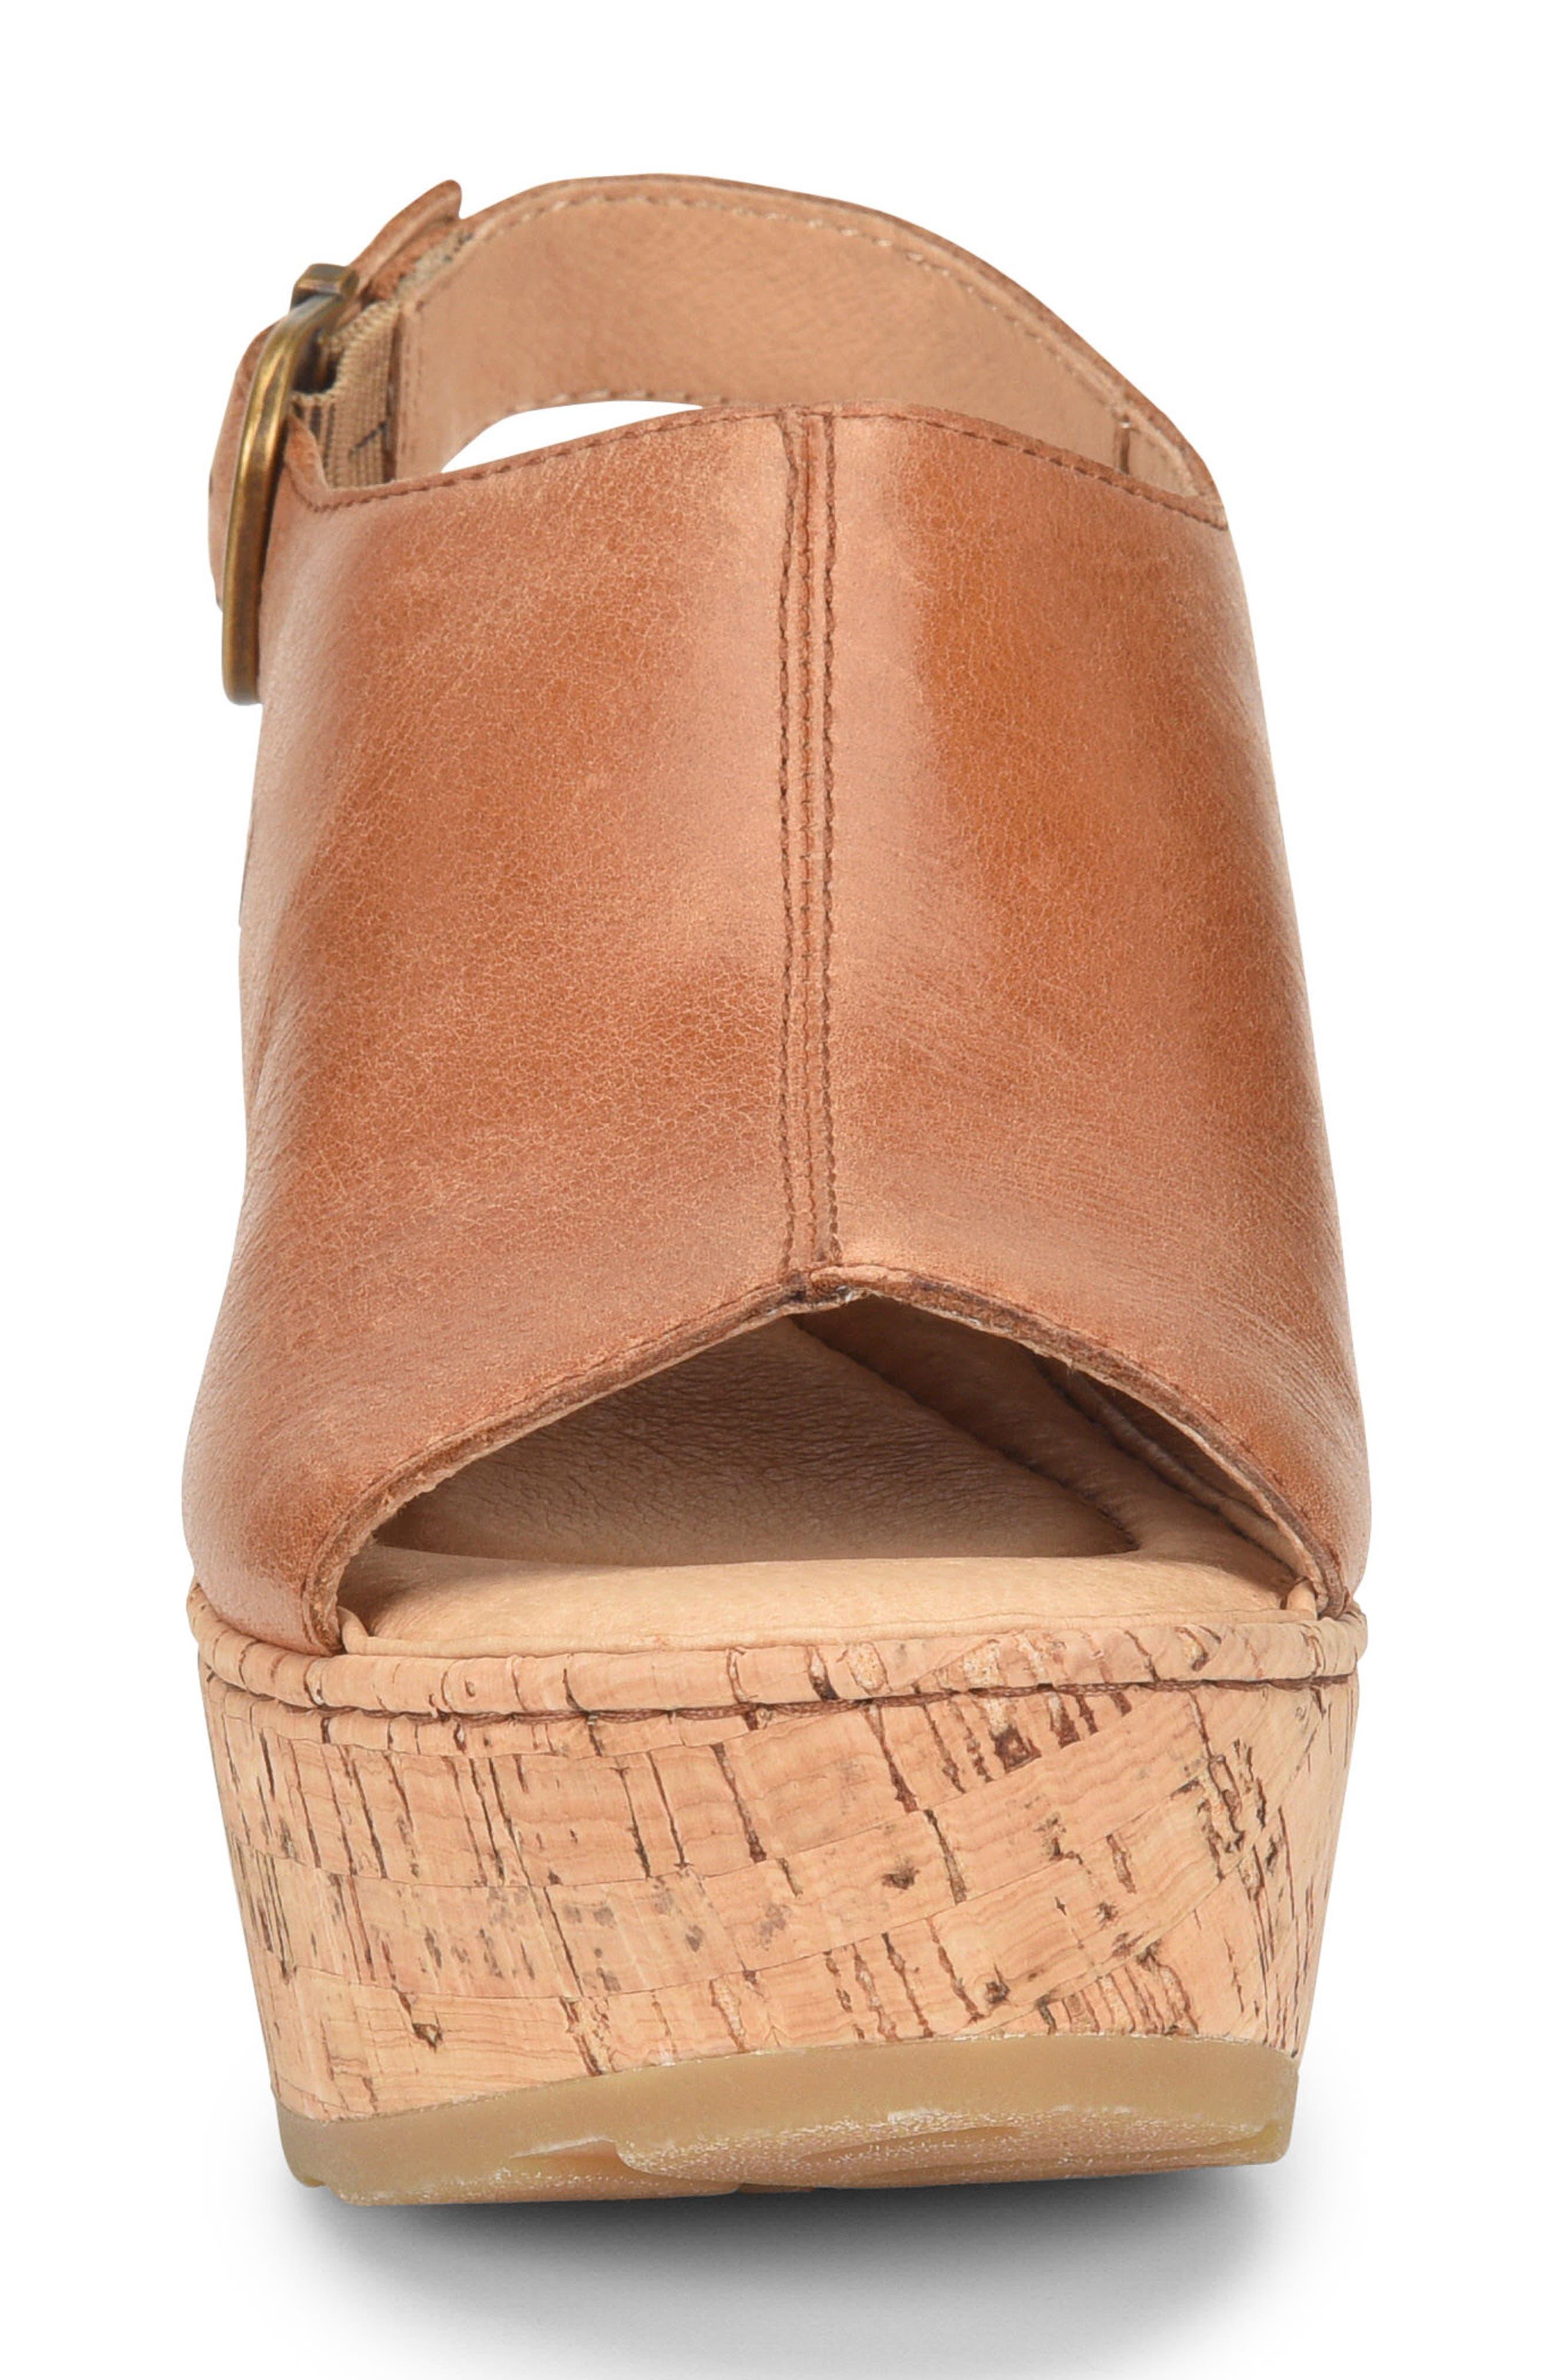 Orbit Platform Wedge Sandal,                             Alternate thumbnail 4, color,                             Brown Leather